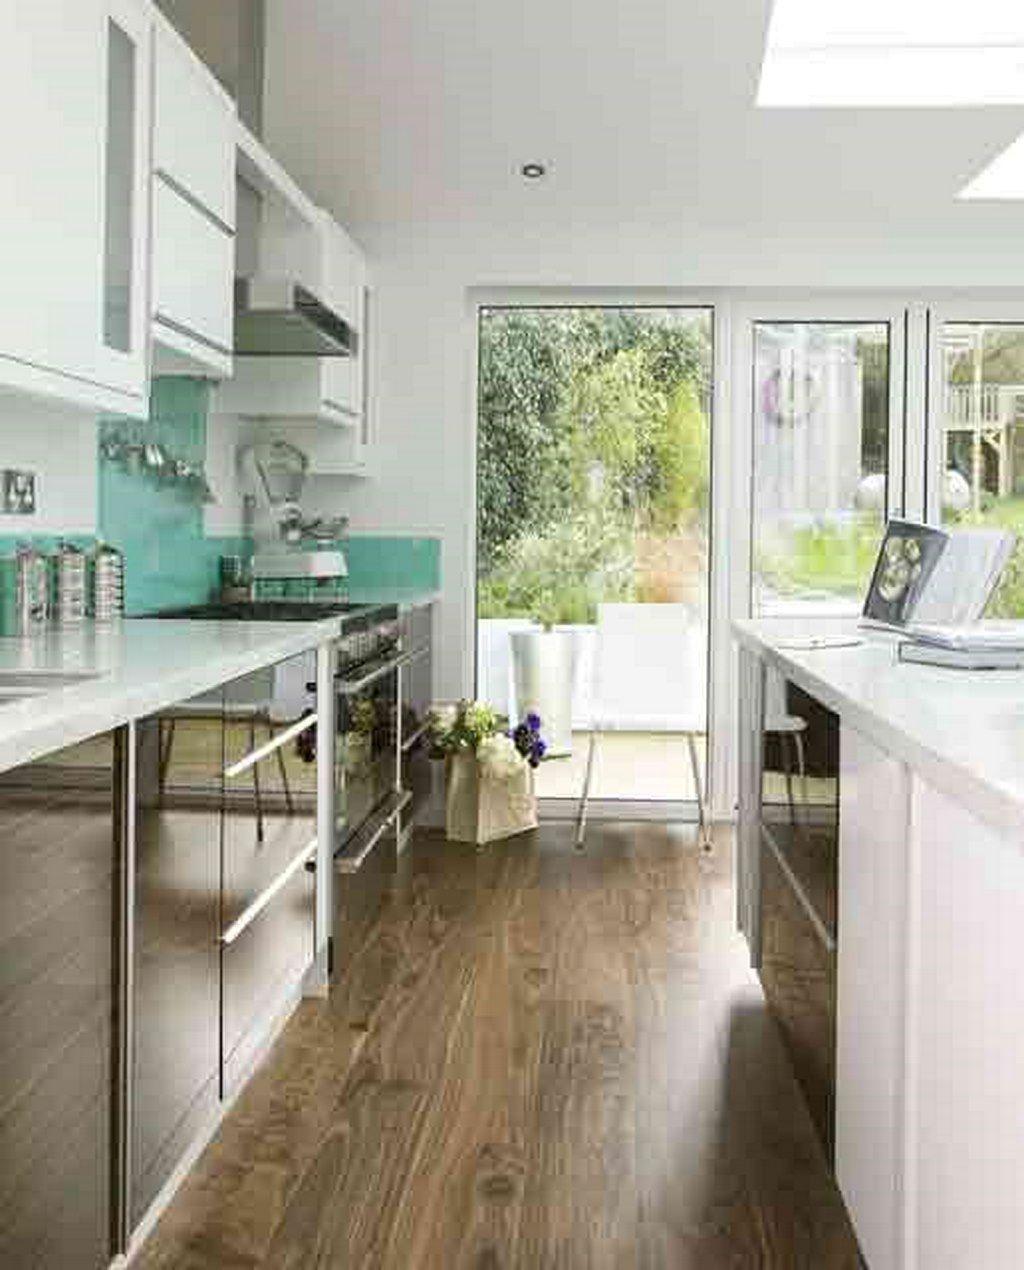 Amusing Designs For Galley Kitchens Galley Kitchen Design Ideas Entrancing Best Small Kitchen Designs Design Inspiration